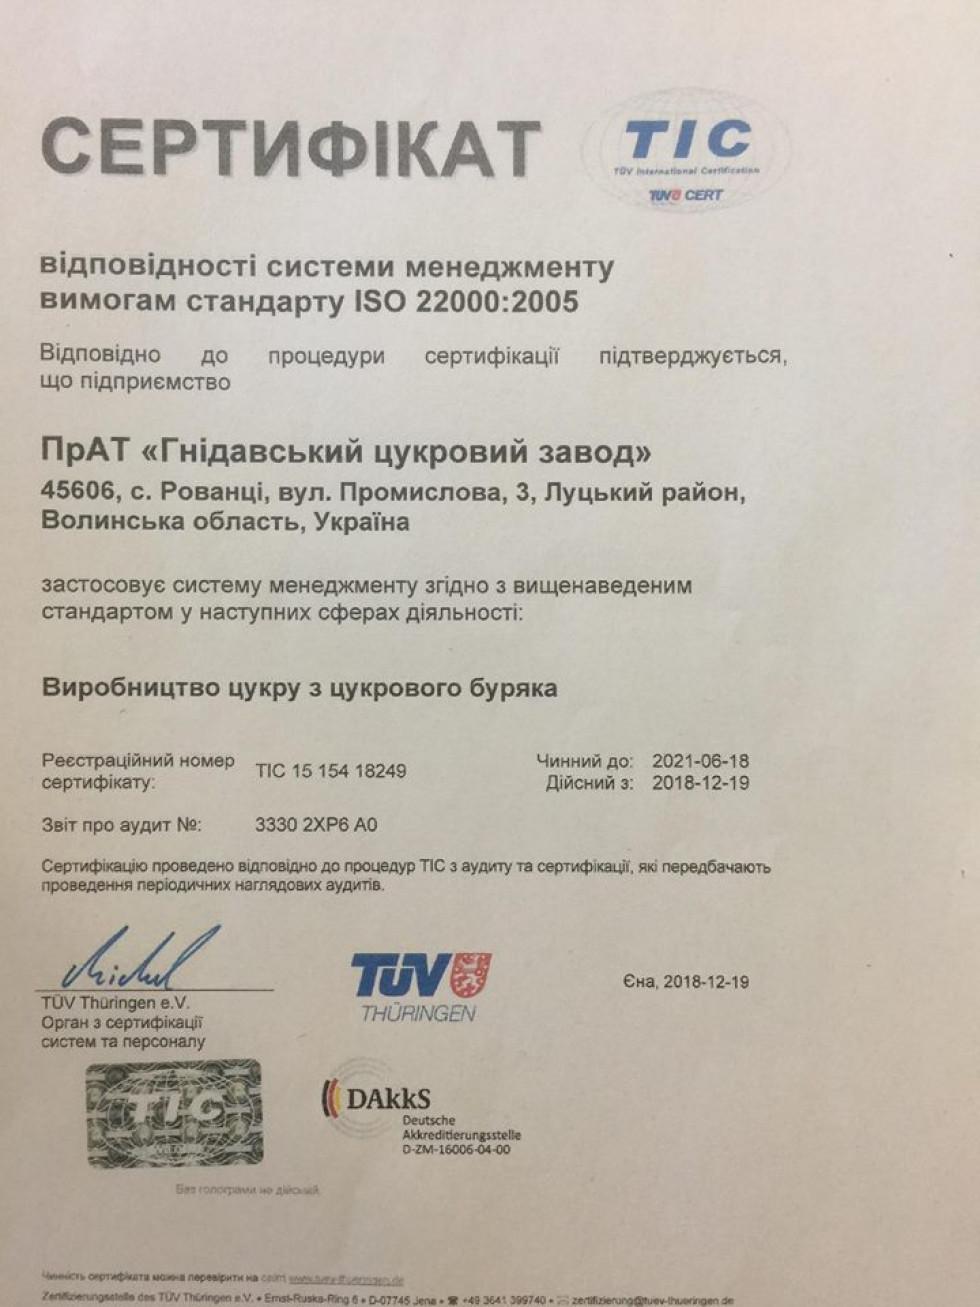 Сртифікат